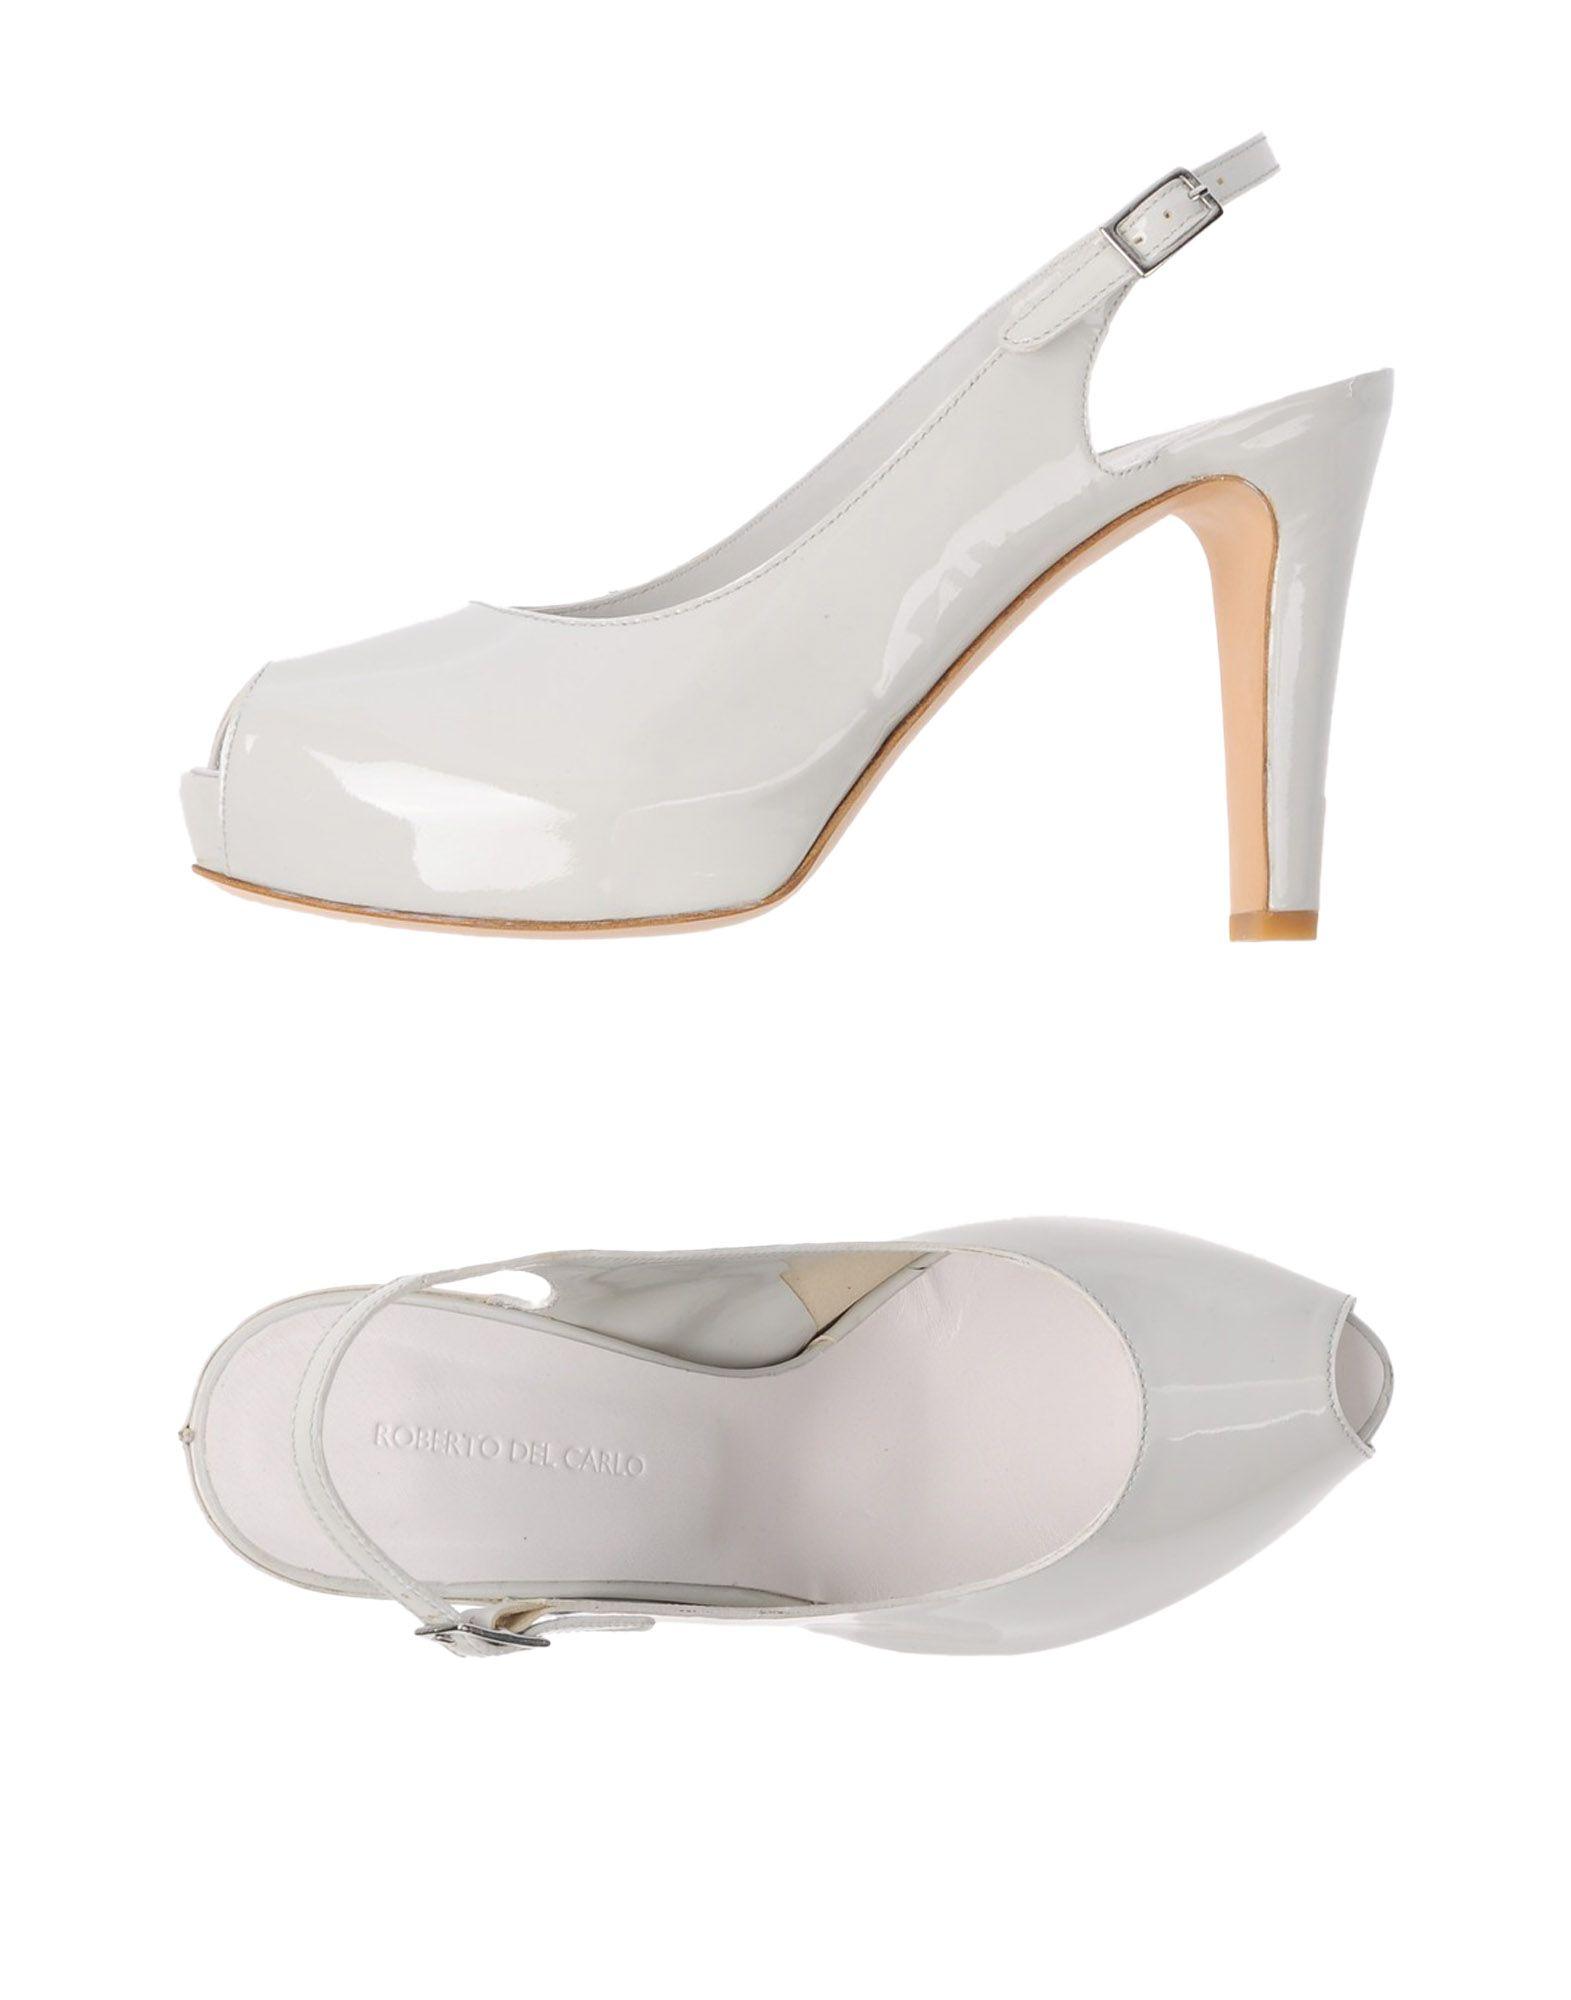 Roberto Del Carlo Sandalen Damen  44986132DE Gute Qualität beliebte Schuhe